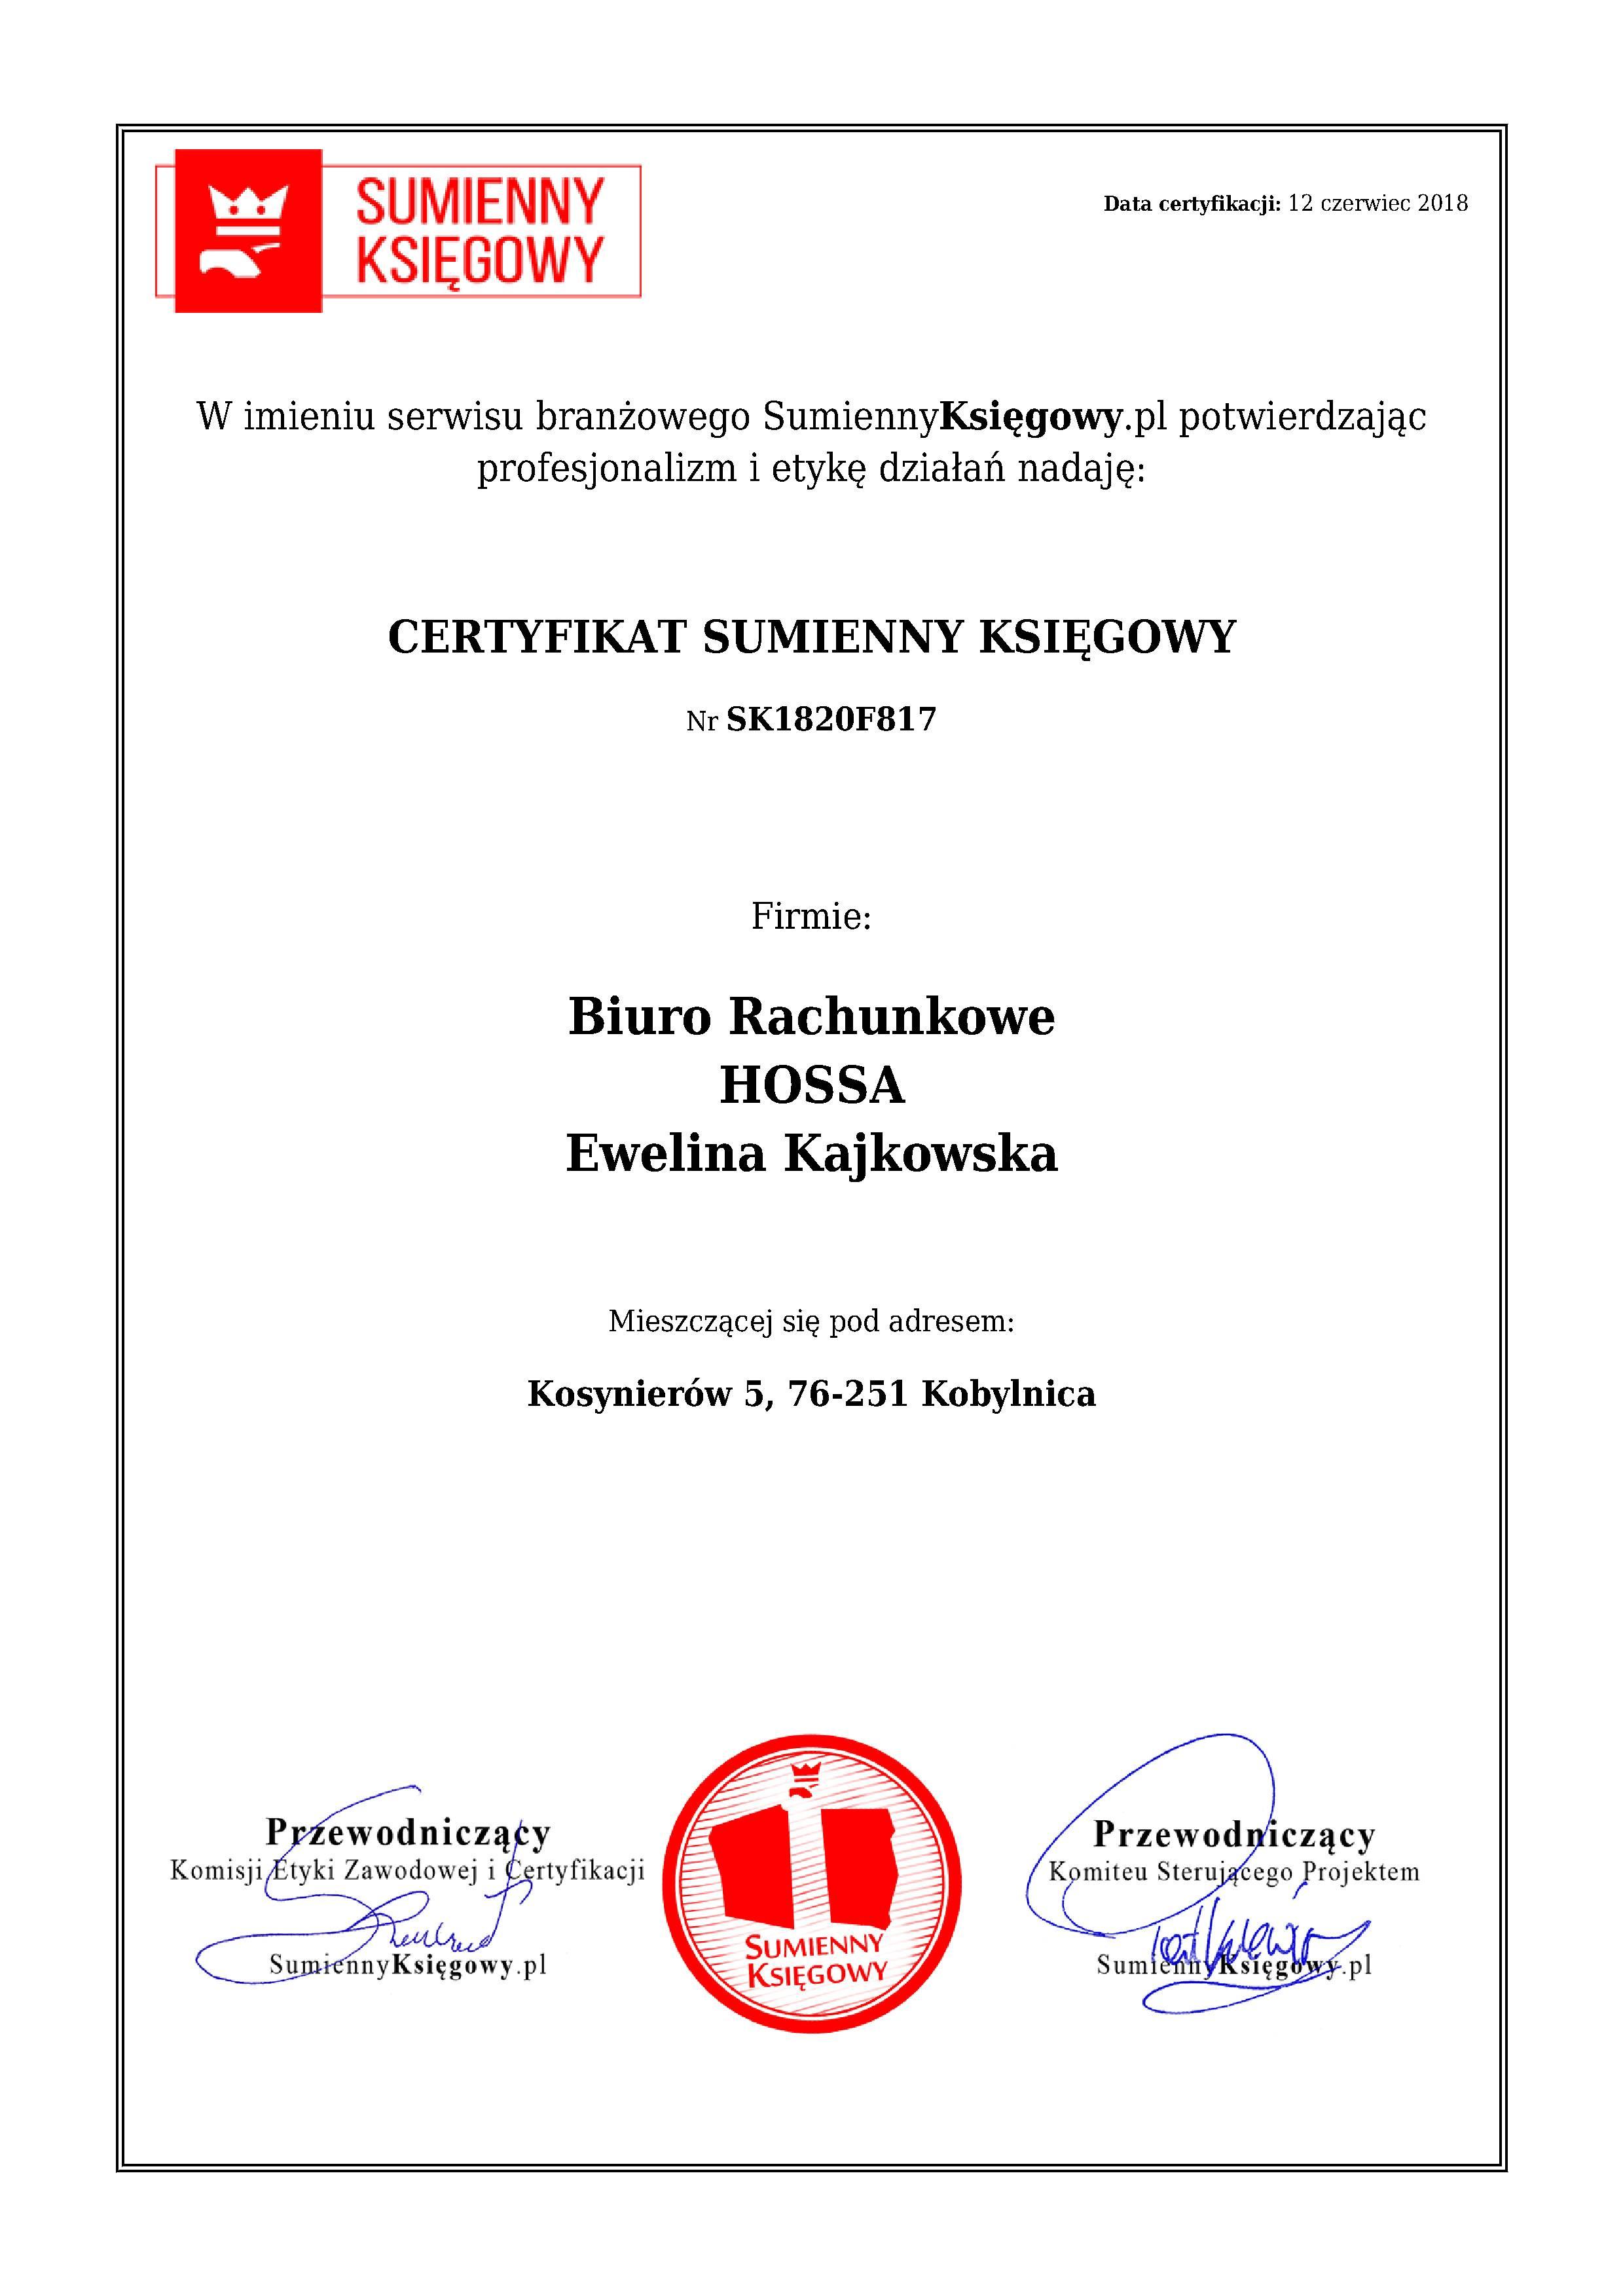 Certyfikat Biuro Rachunkowe HOSSA Ewelina Kajkowska